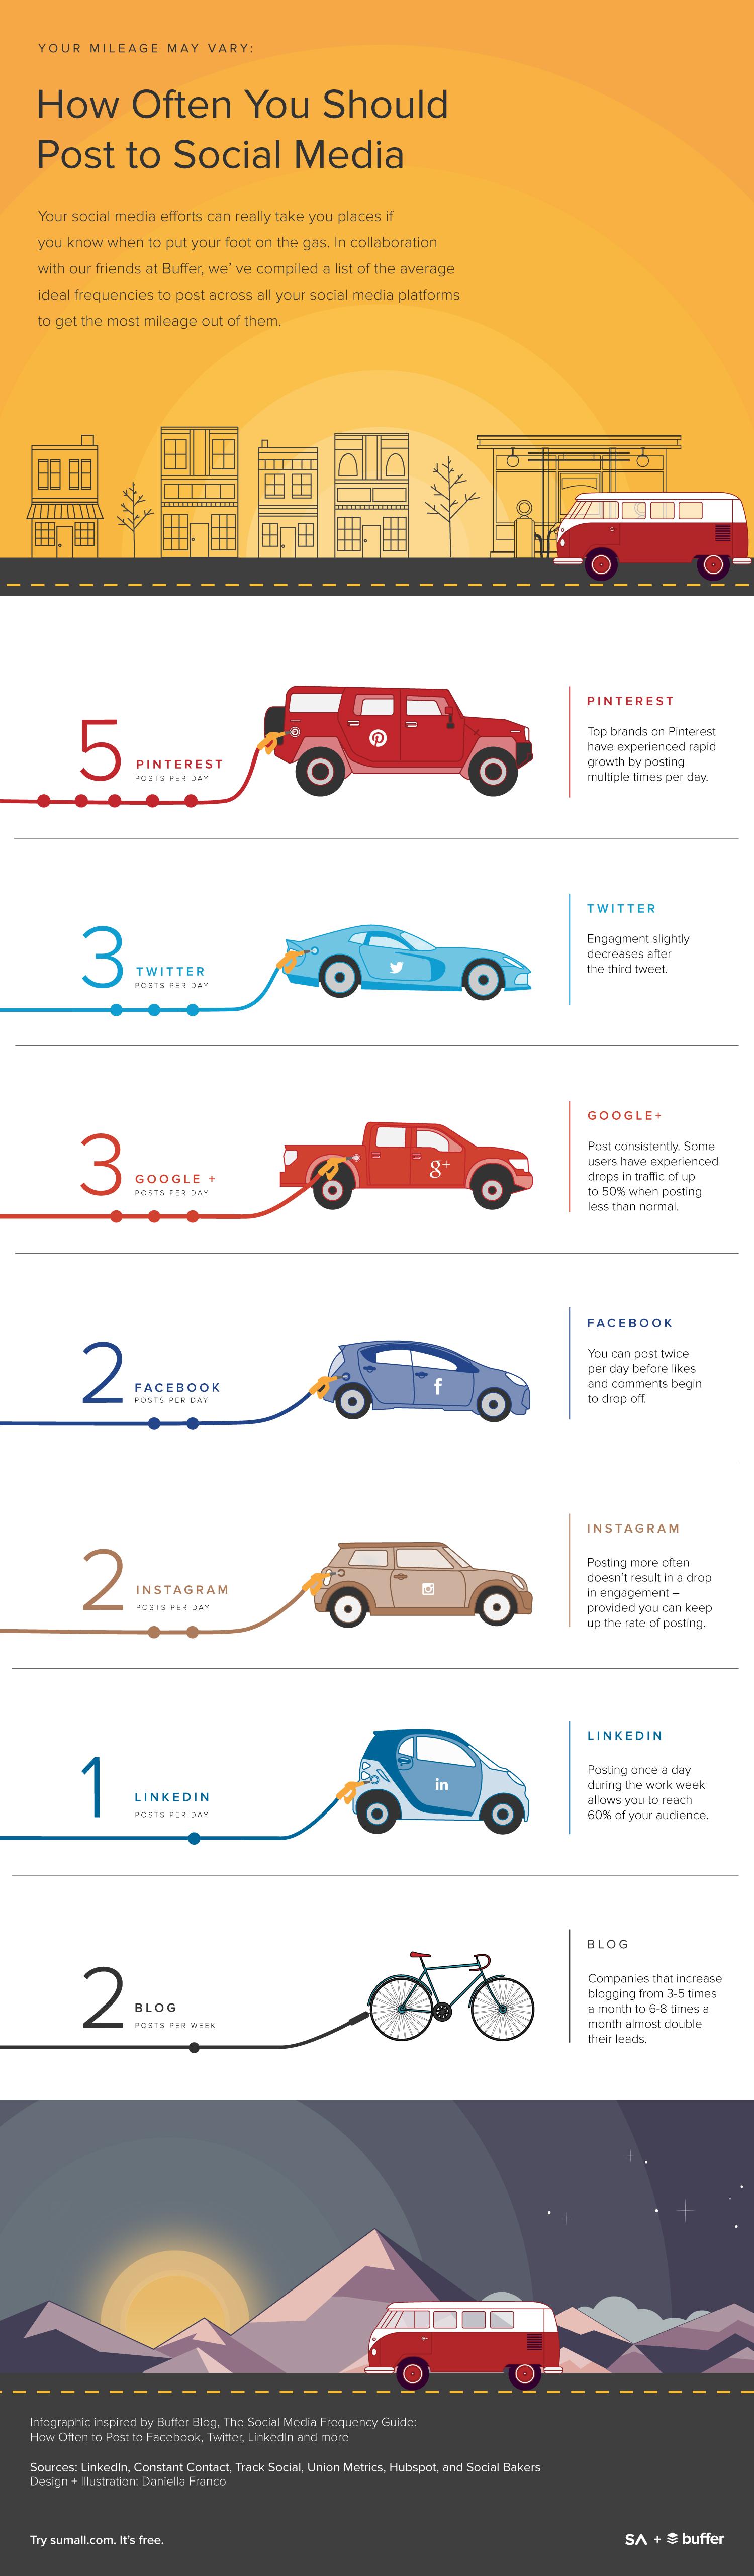 Buffer blog social timing infographic